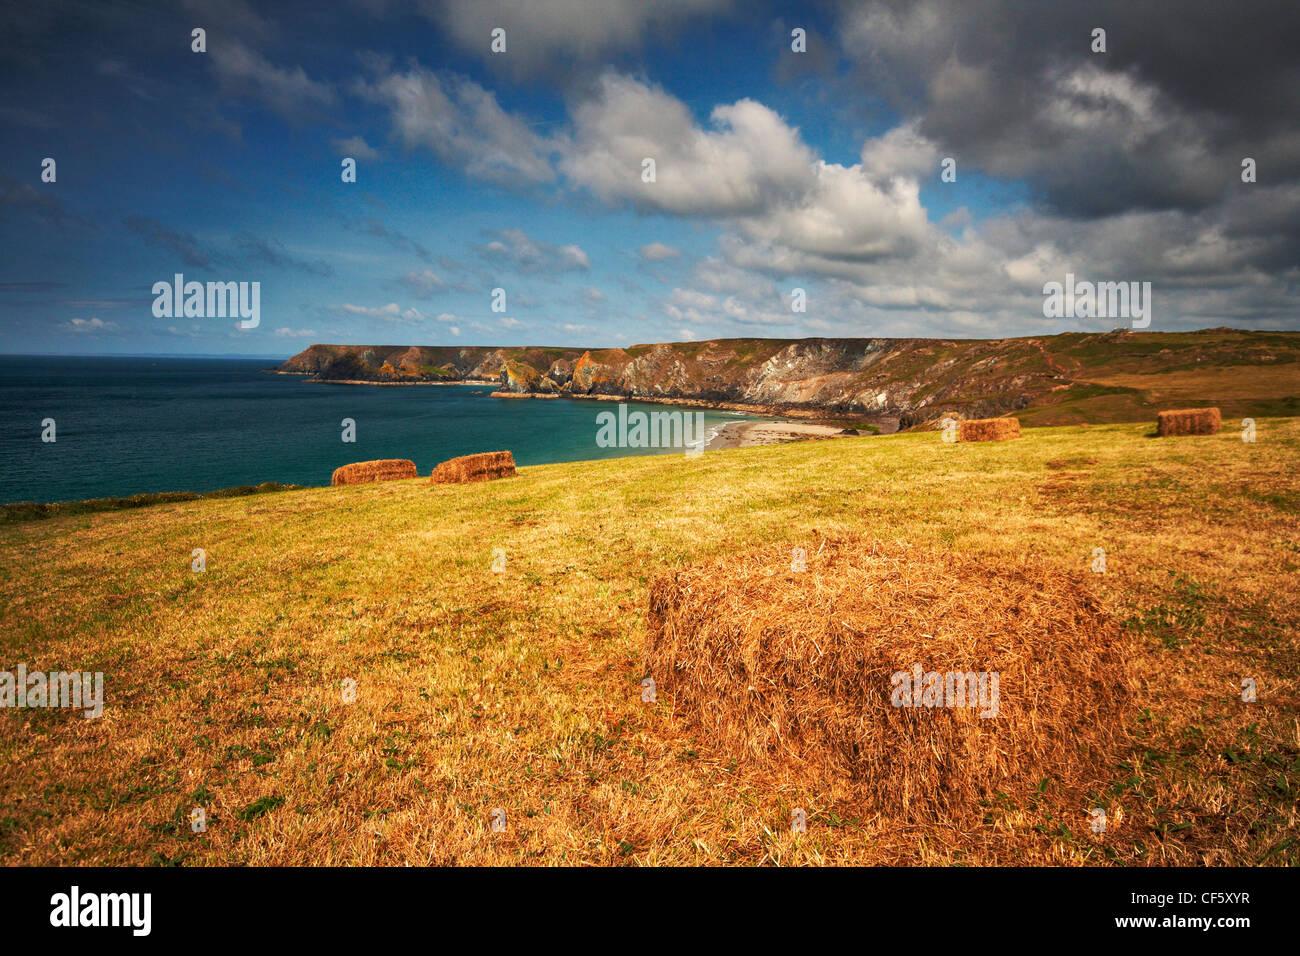 A freshly cut summery meadow on the Lizard Peninsula in Cornwall. - Stock Image